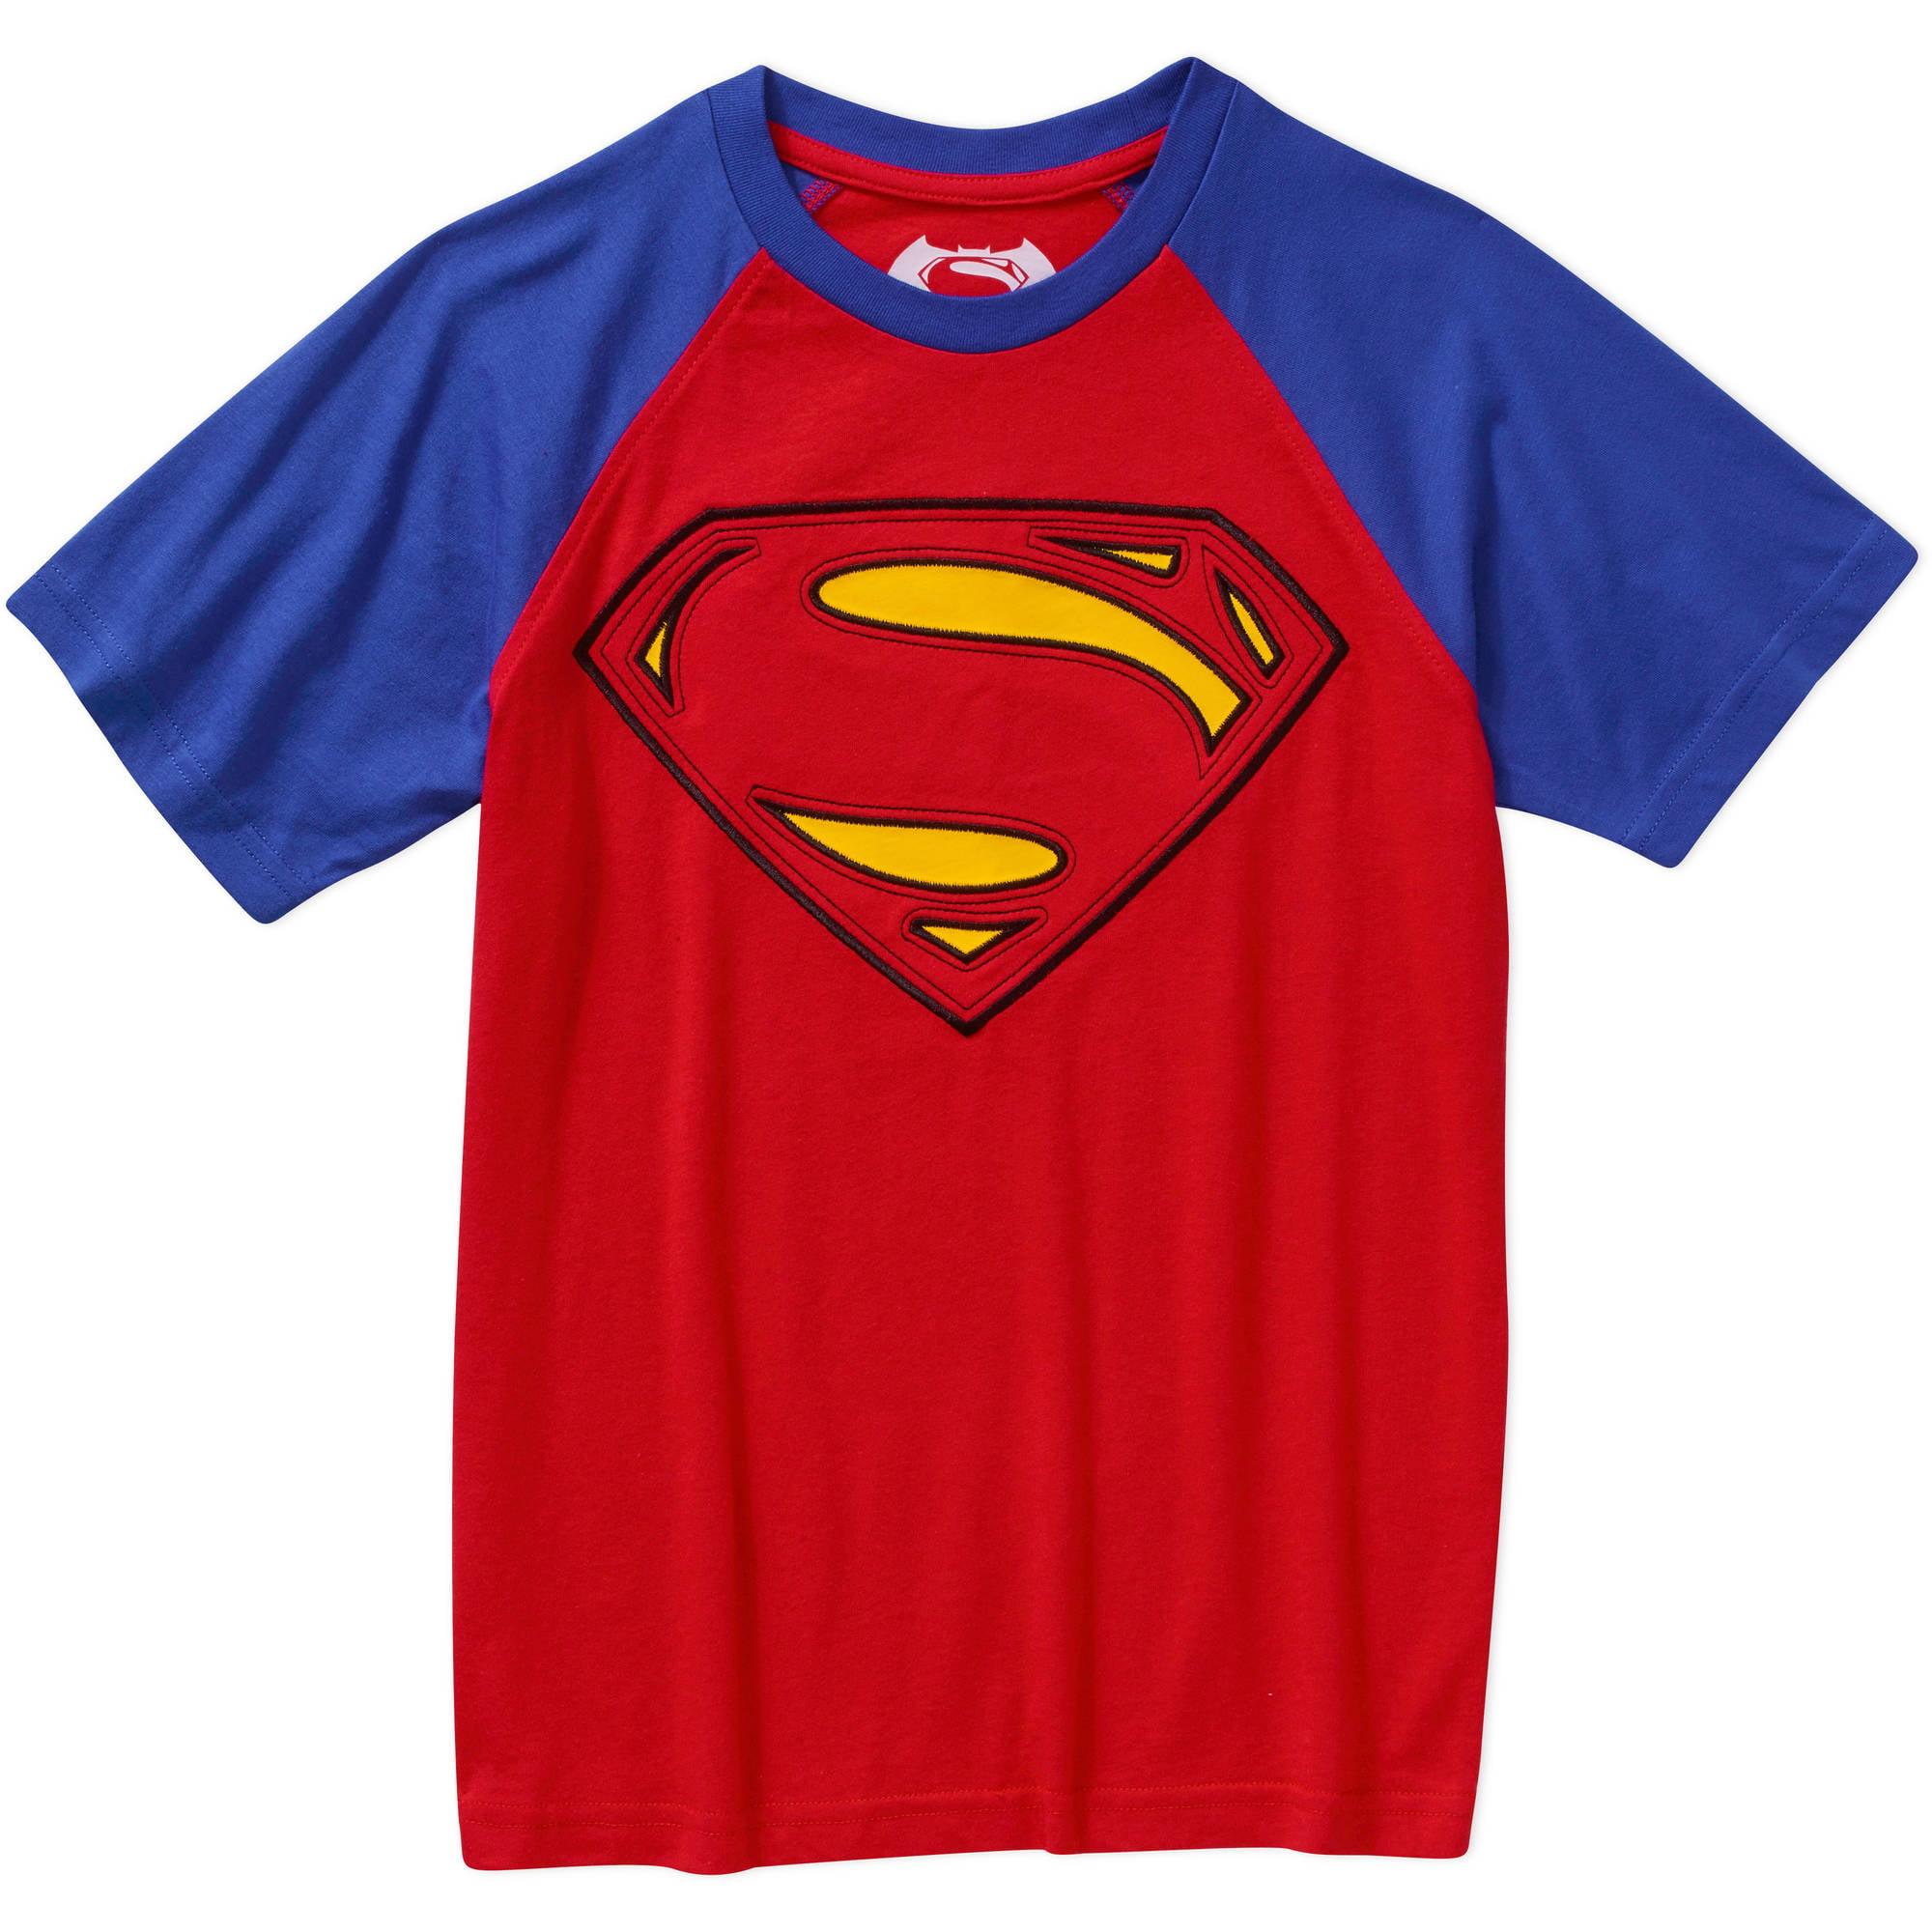 DC Comics Superman Boys Raglan Sleeve Graphic Tee